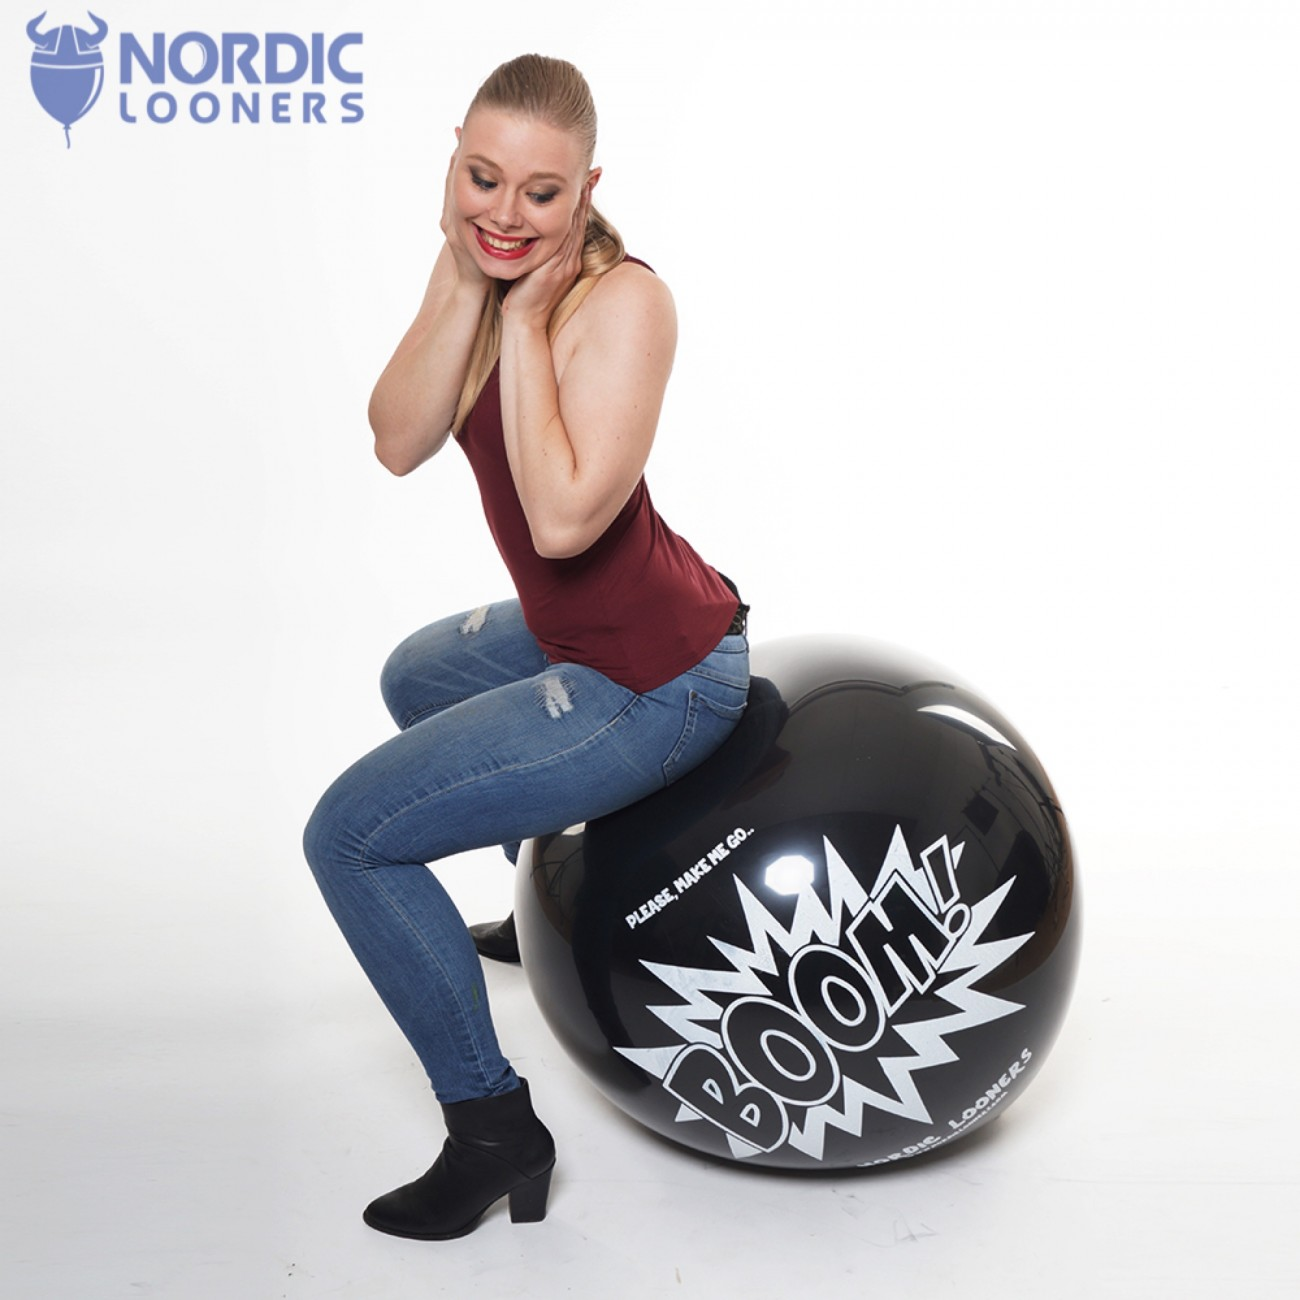 "Nordic Looners 45\\"" BOOM! NL45-Boom 61,01 DKK Nordic Looners"